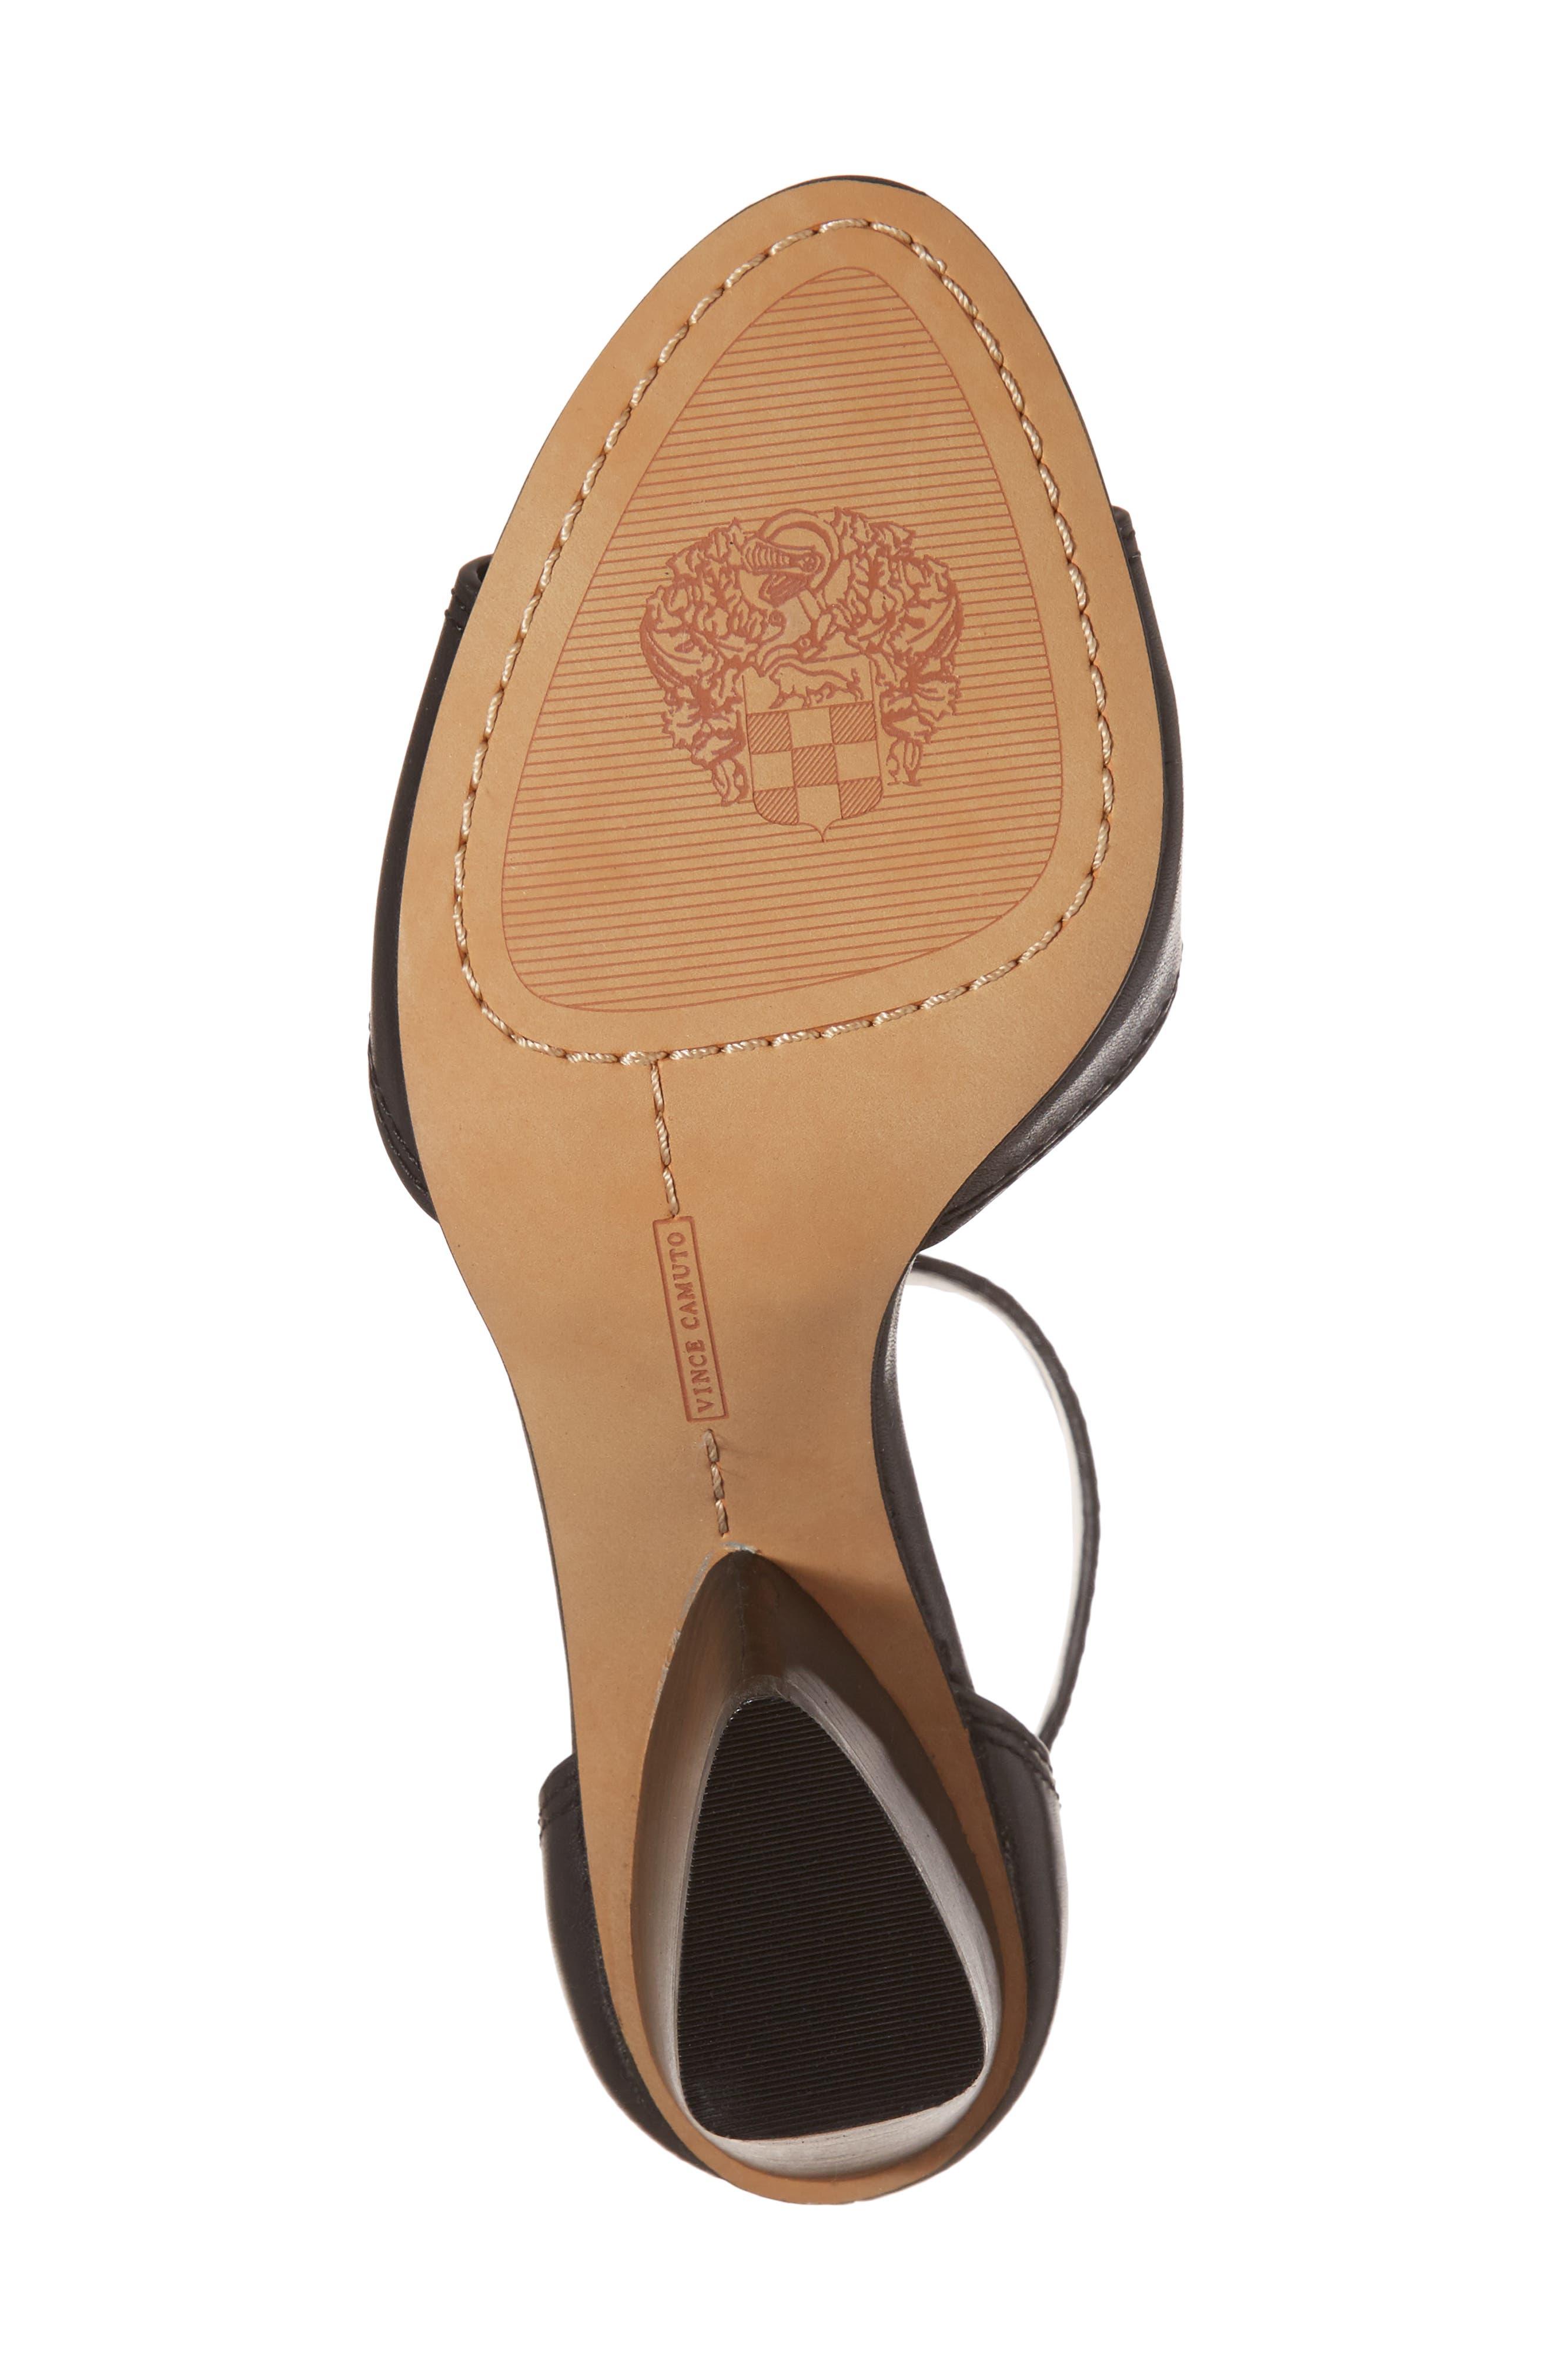 Driton Ankle Strap Sandal,                             Alternate thumbnail 6, color,                             Black Leather